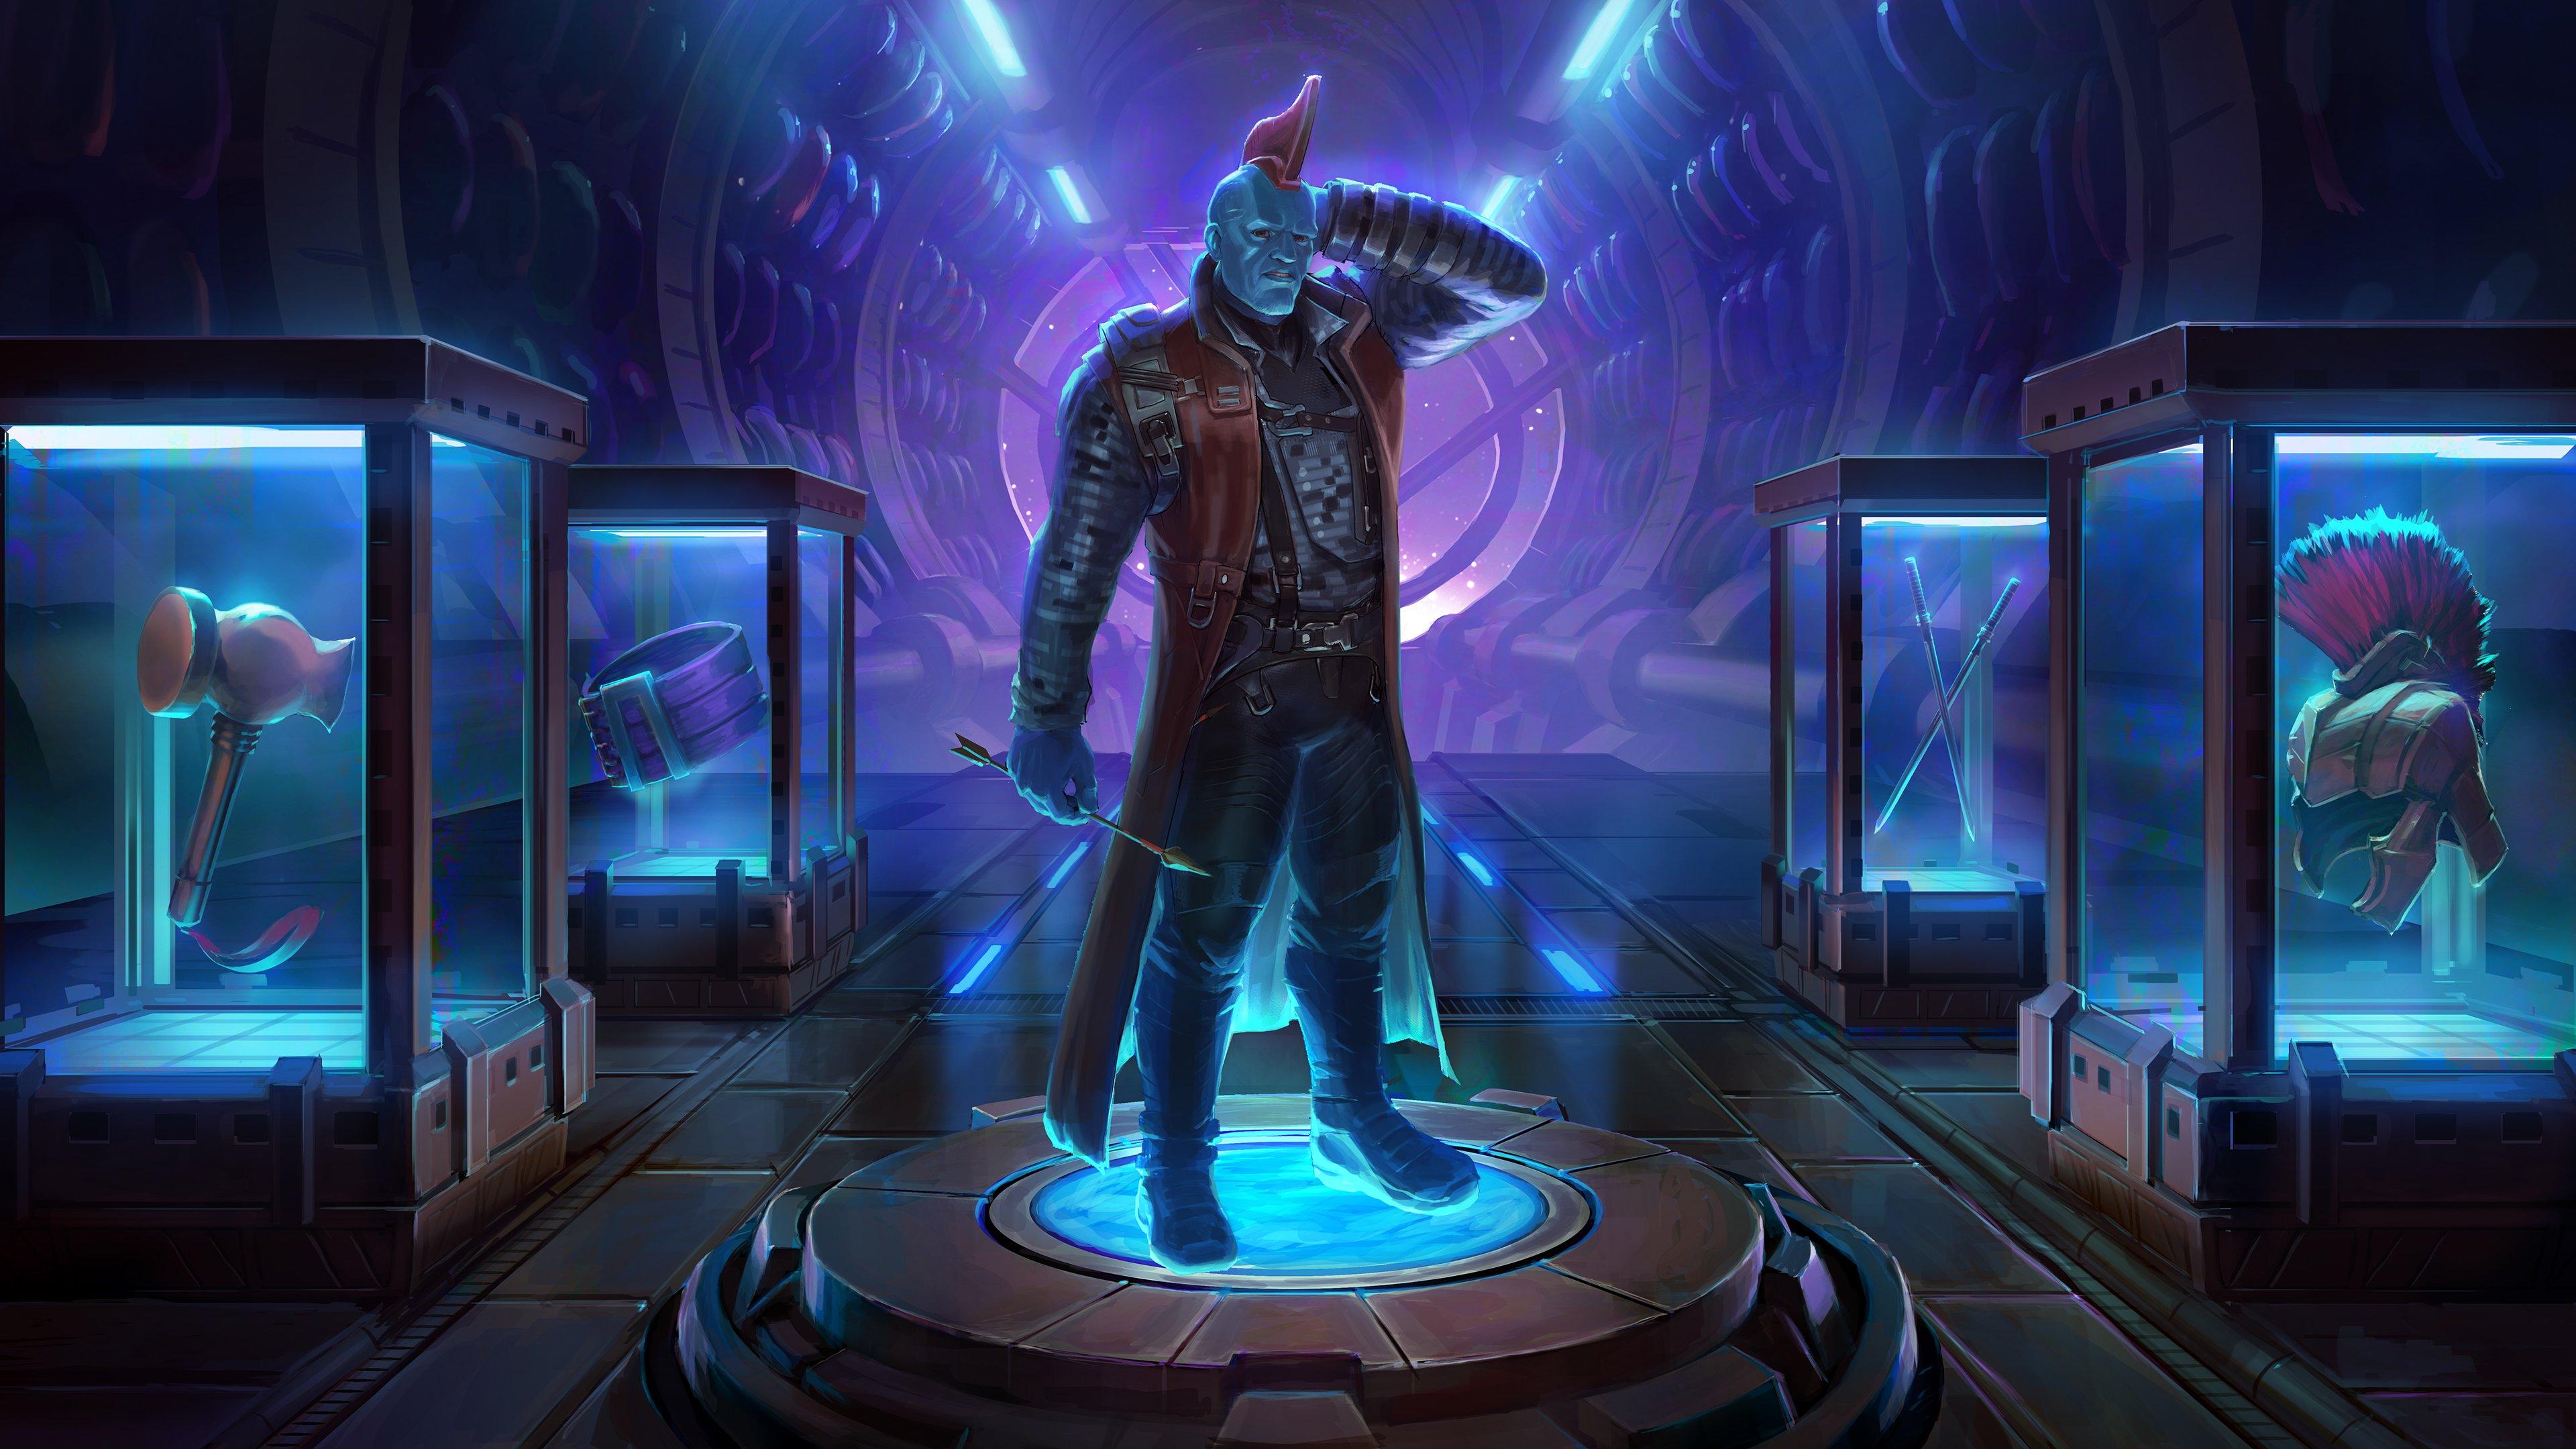 Wallpaper Yondu Marvel: Contest of Champions